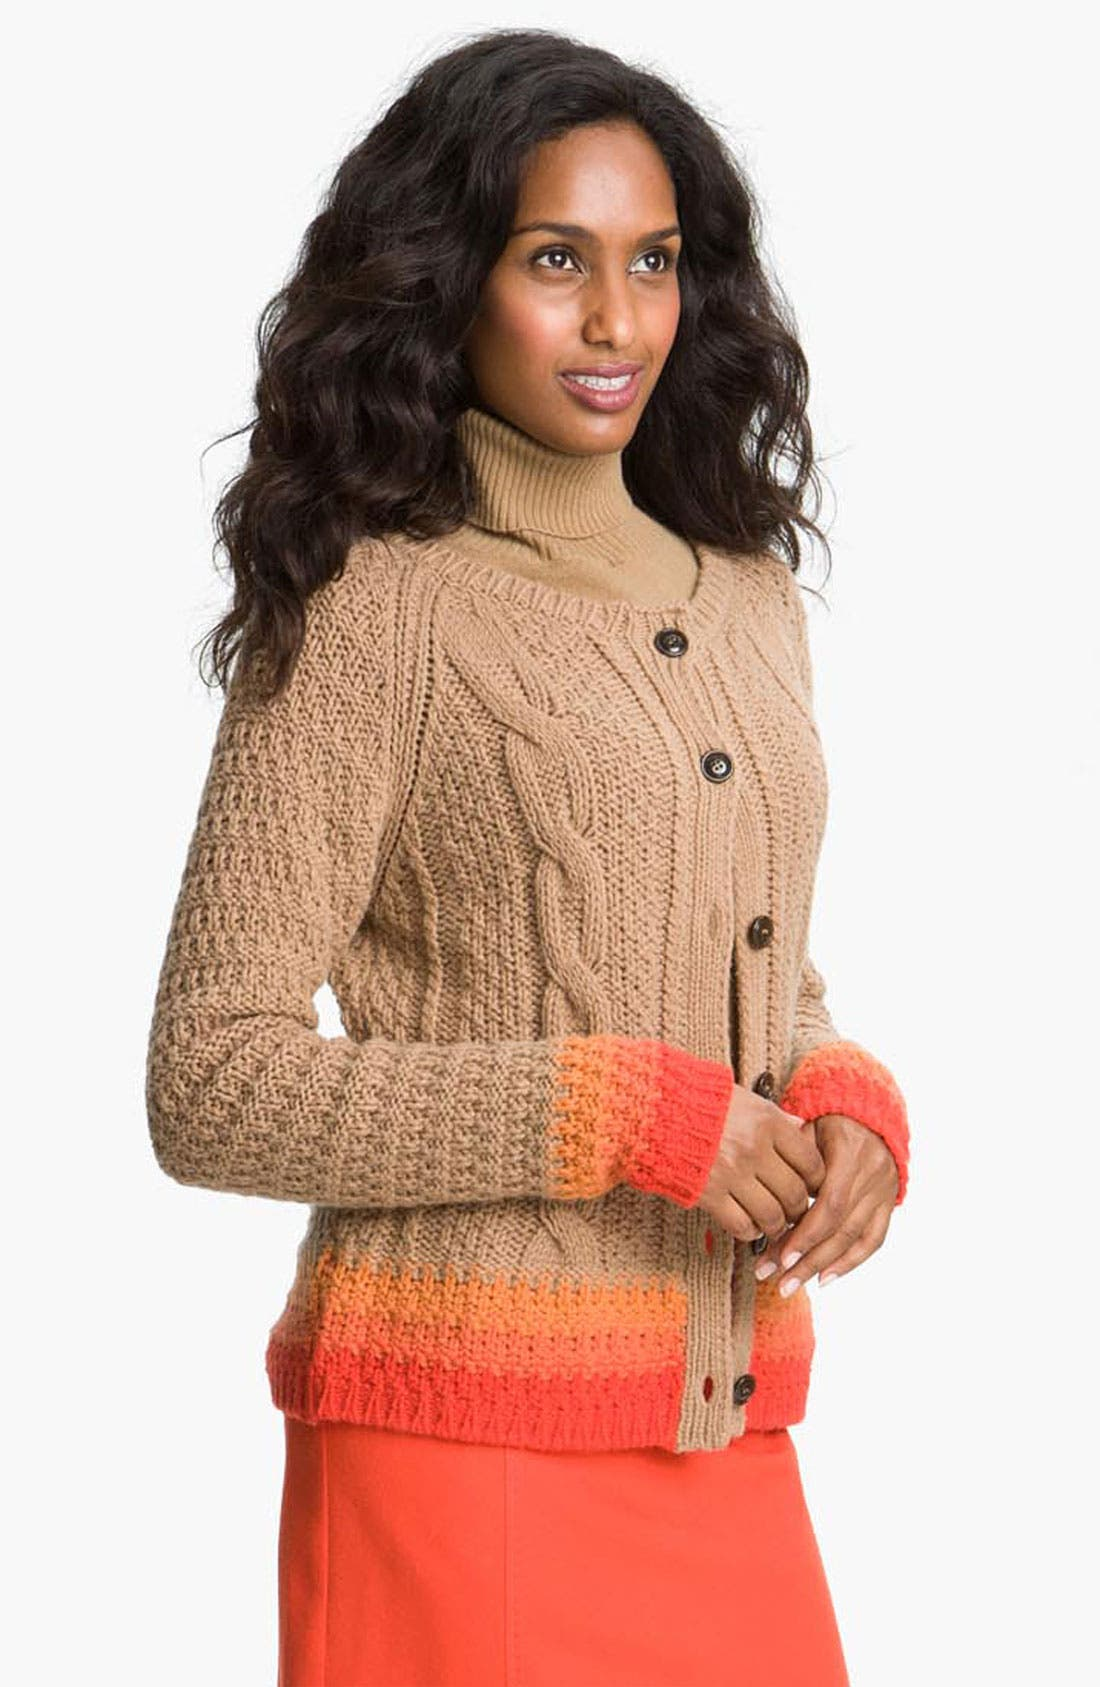 Main Image - Weekend Max Mara 'Nerina' Knit Sweater